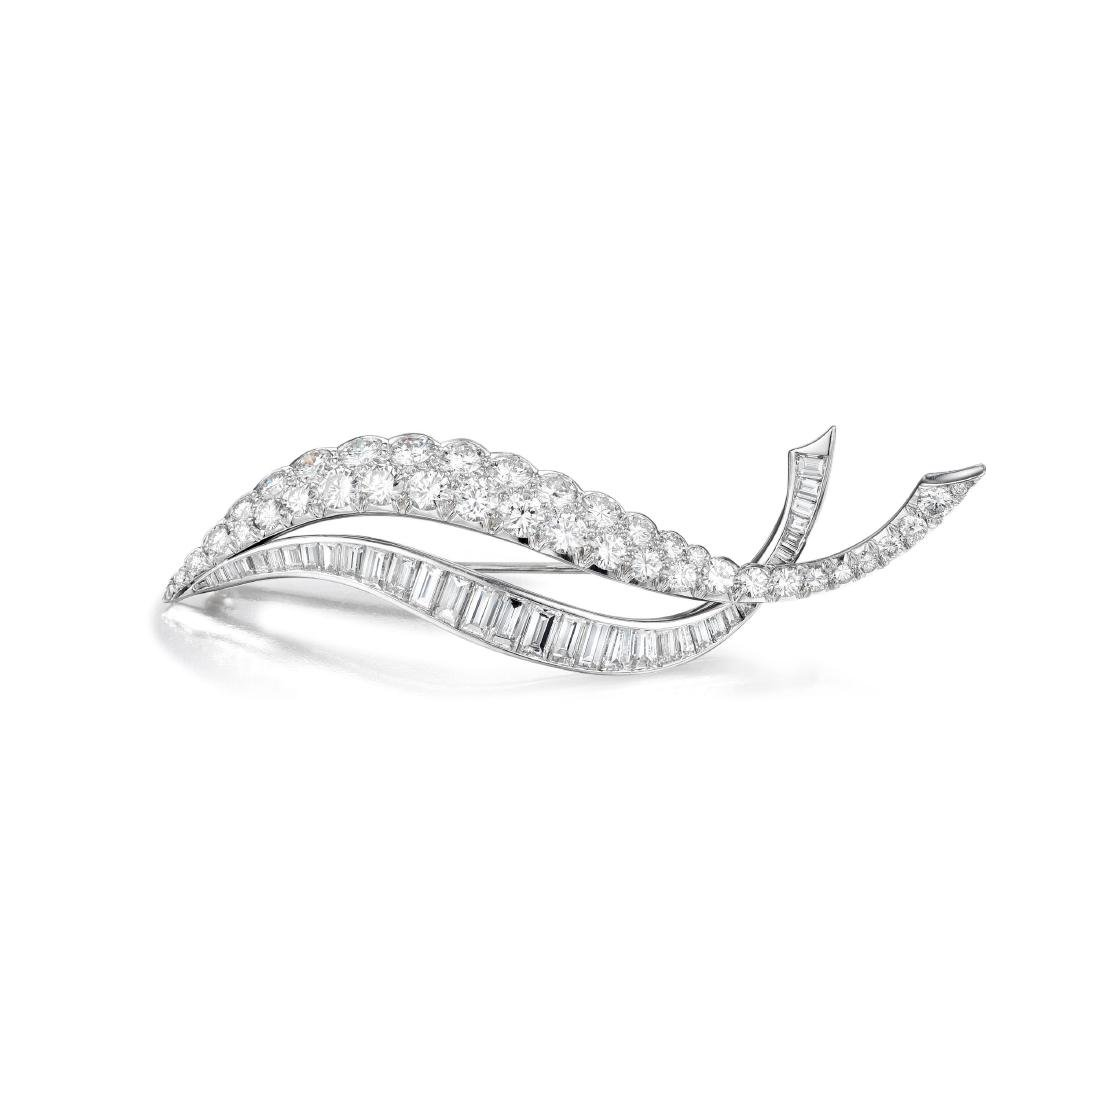 A Platinum Diamond Brooch